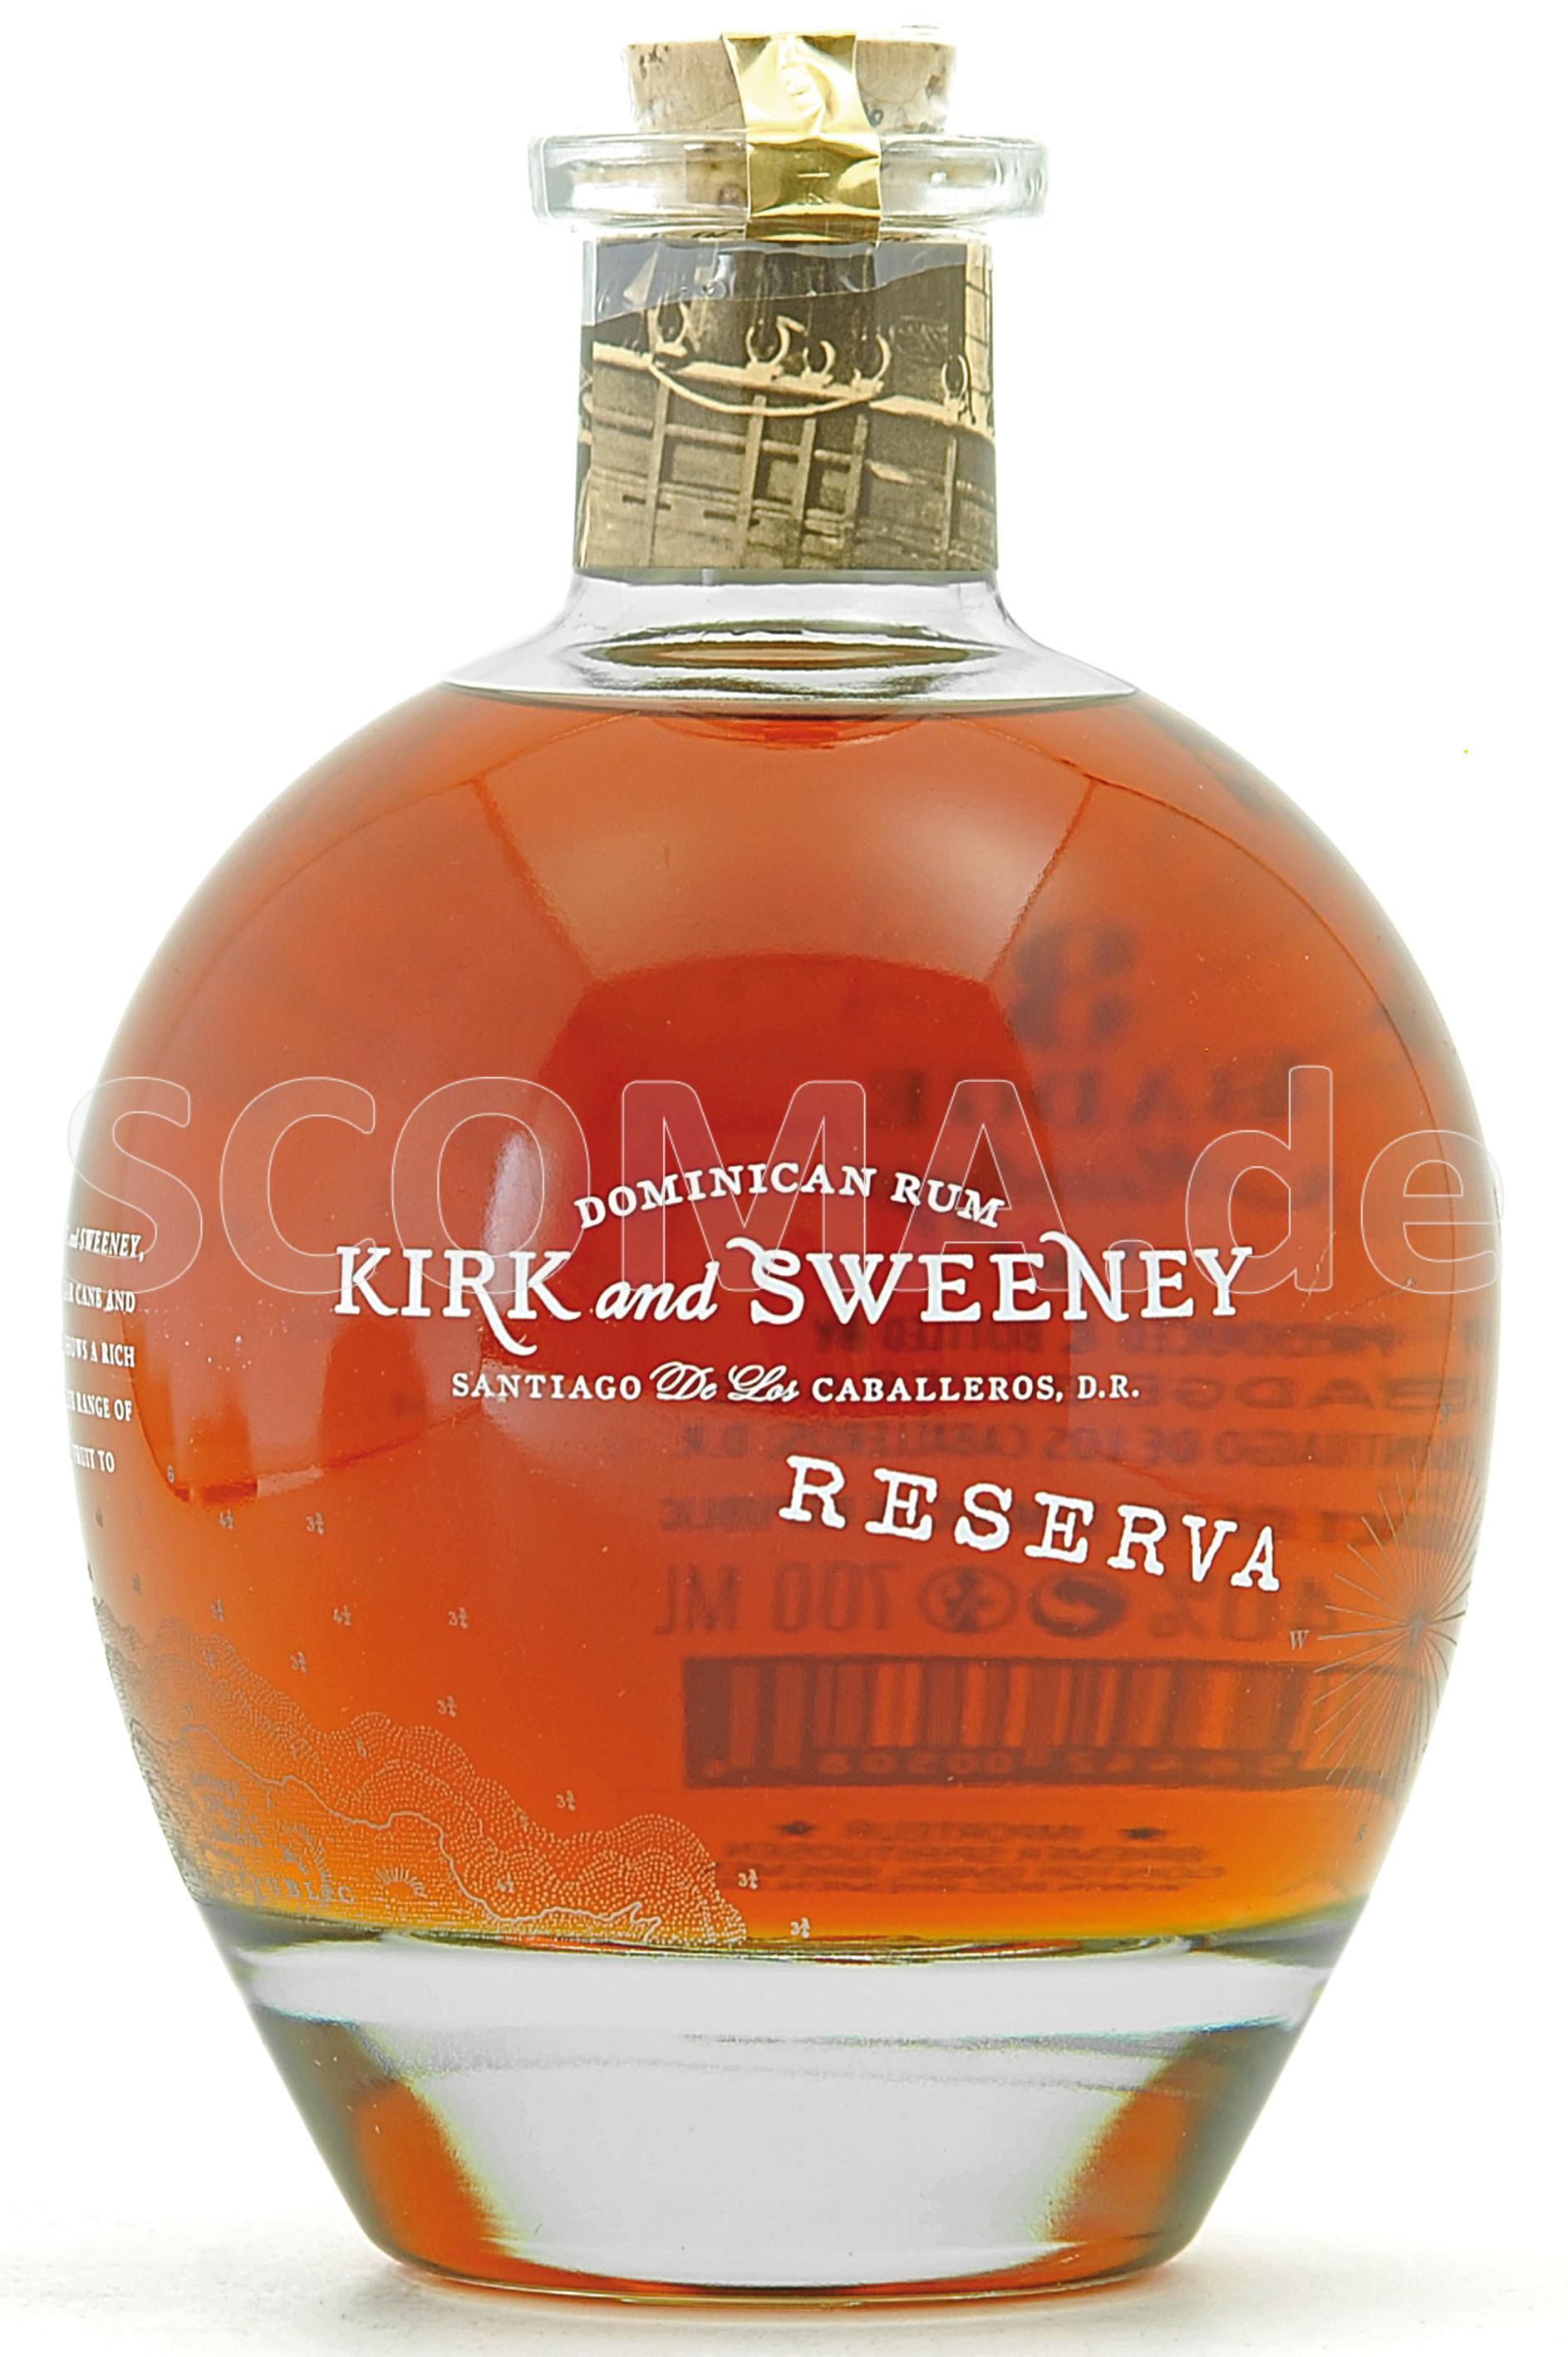 Kirk and Sweeney Reserva Rum